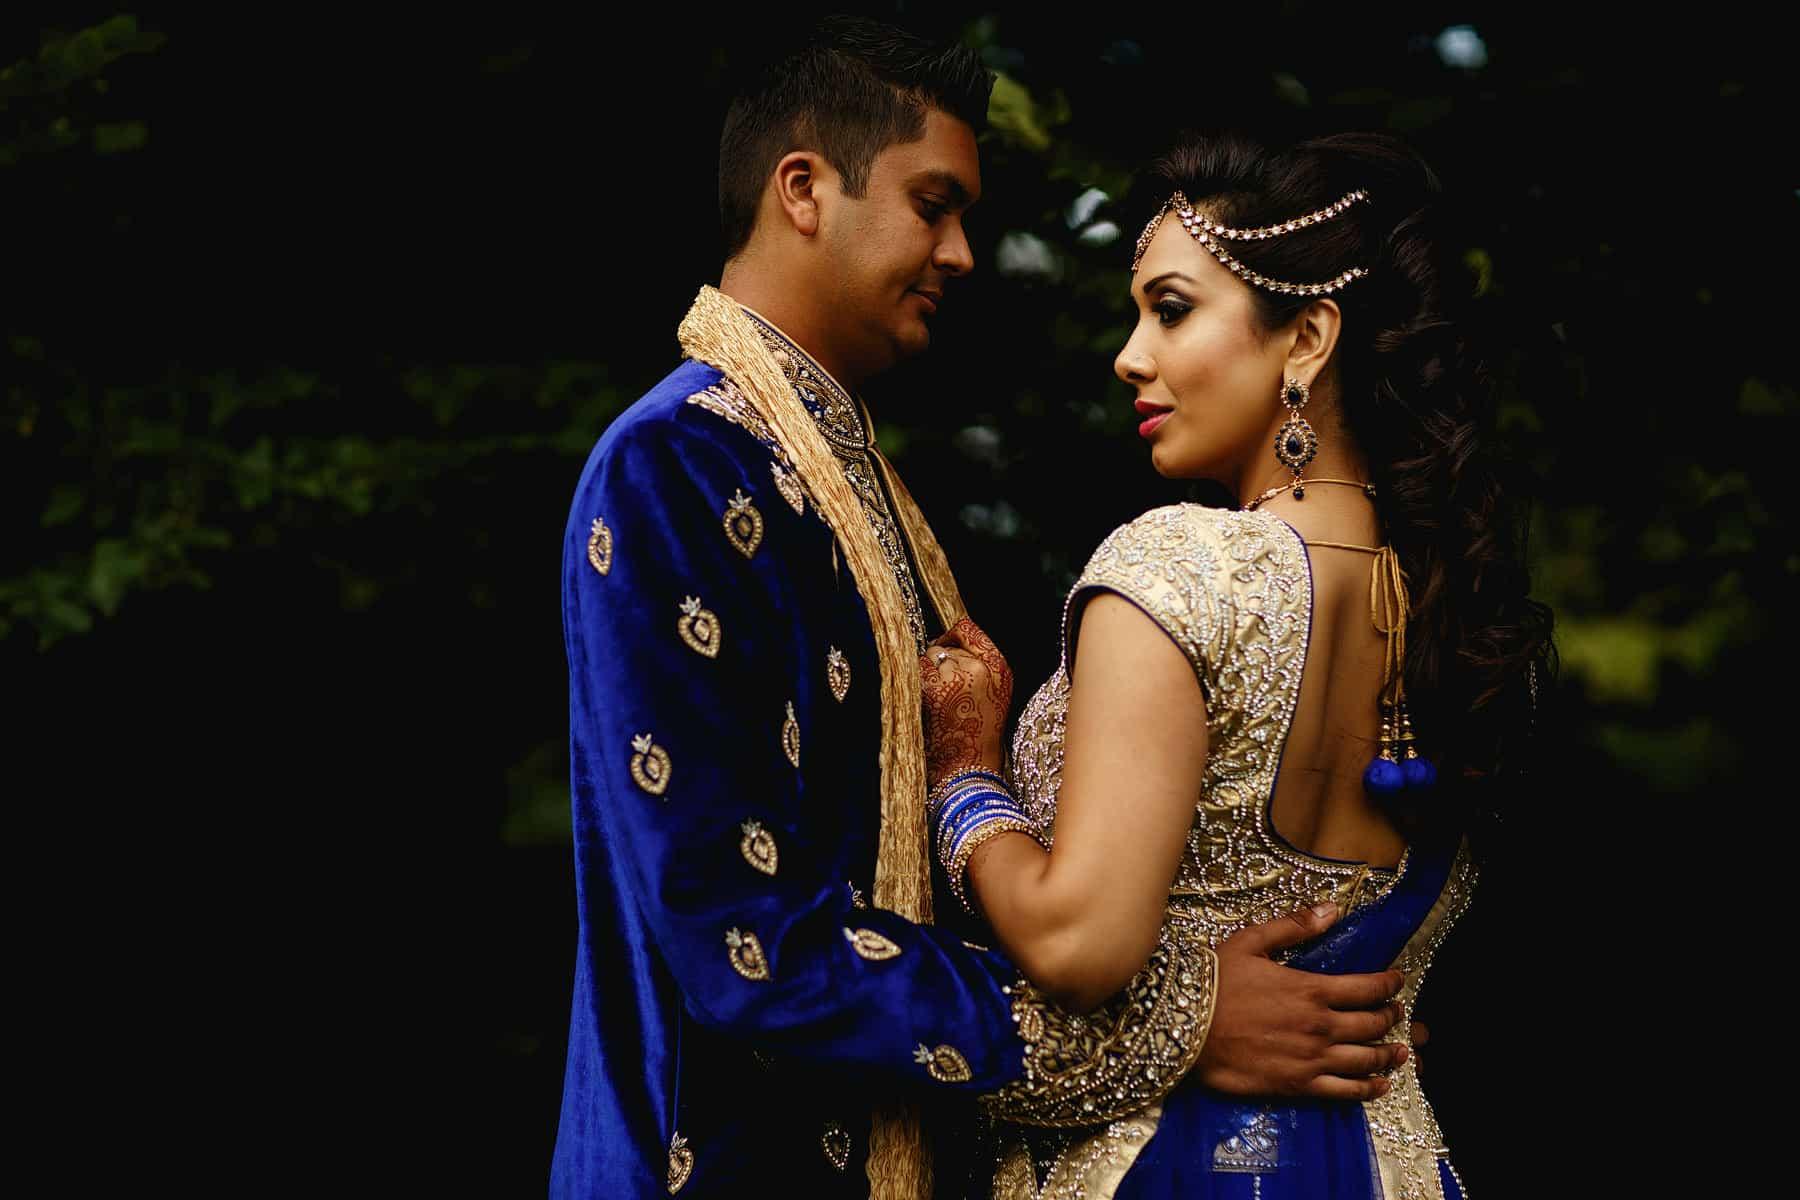 asian wedding photographer ditton manor